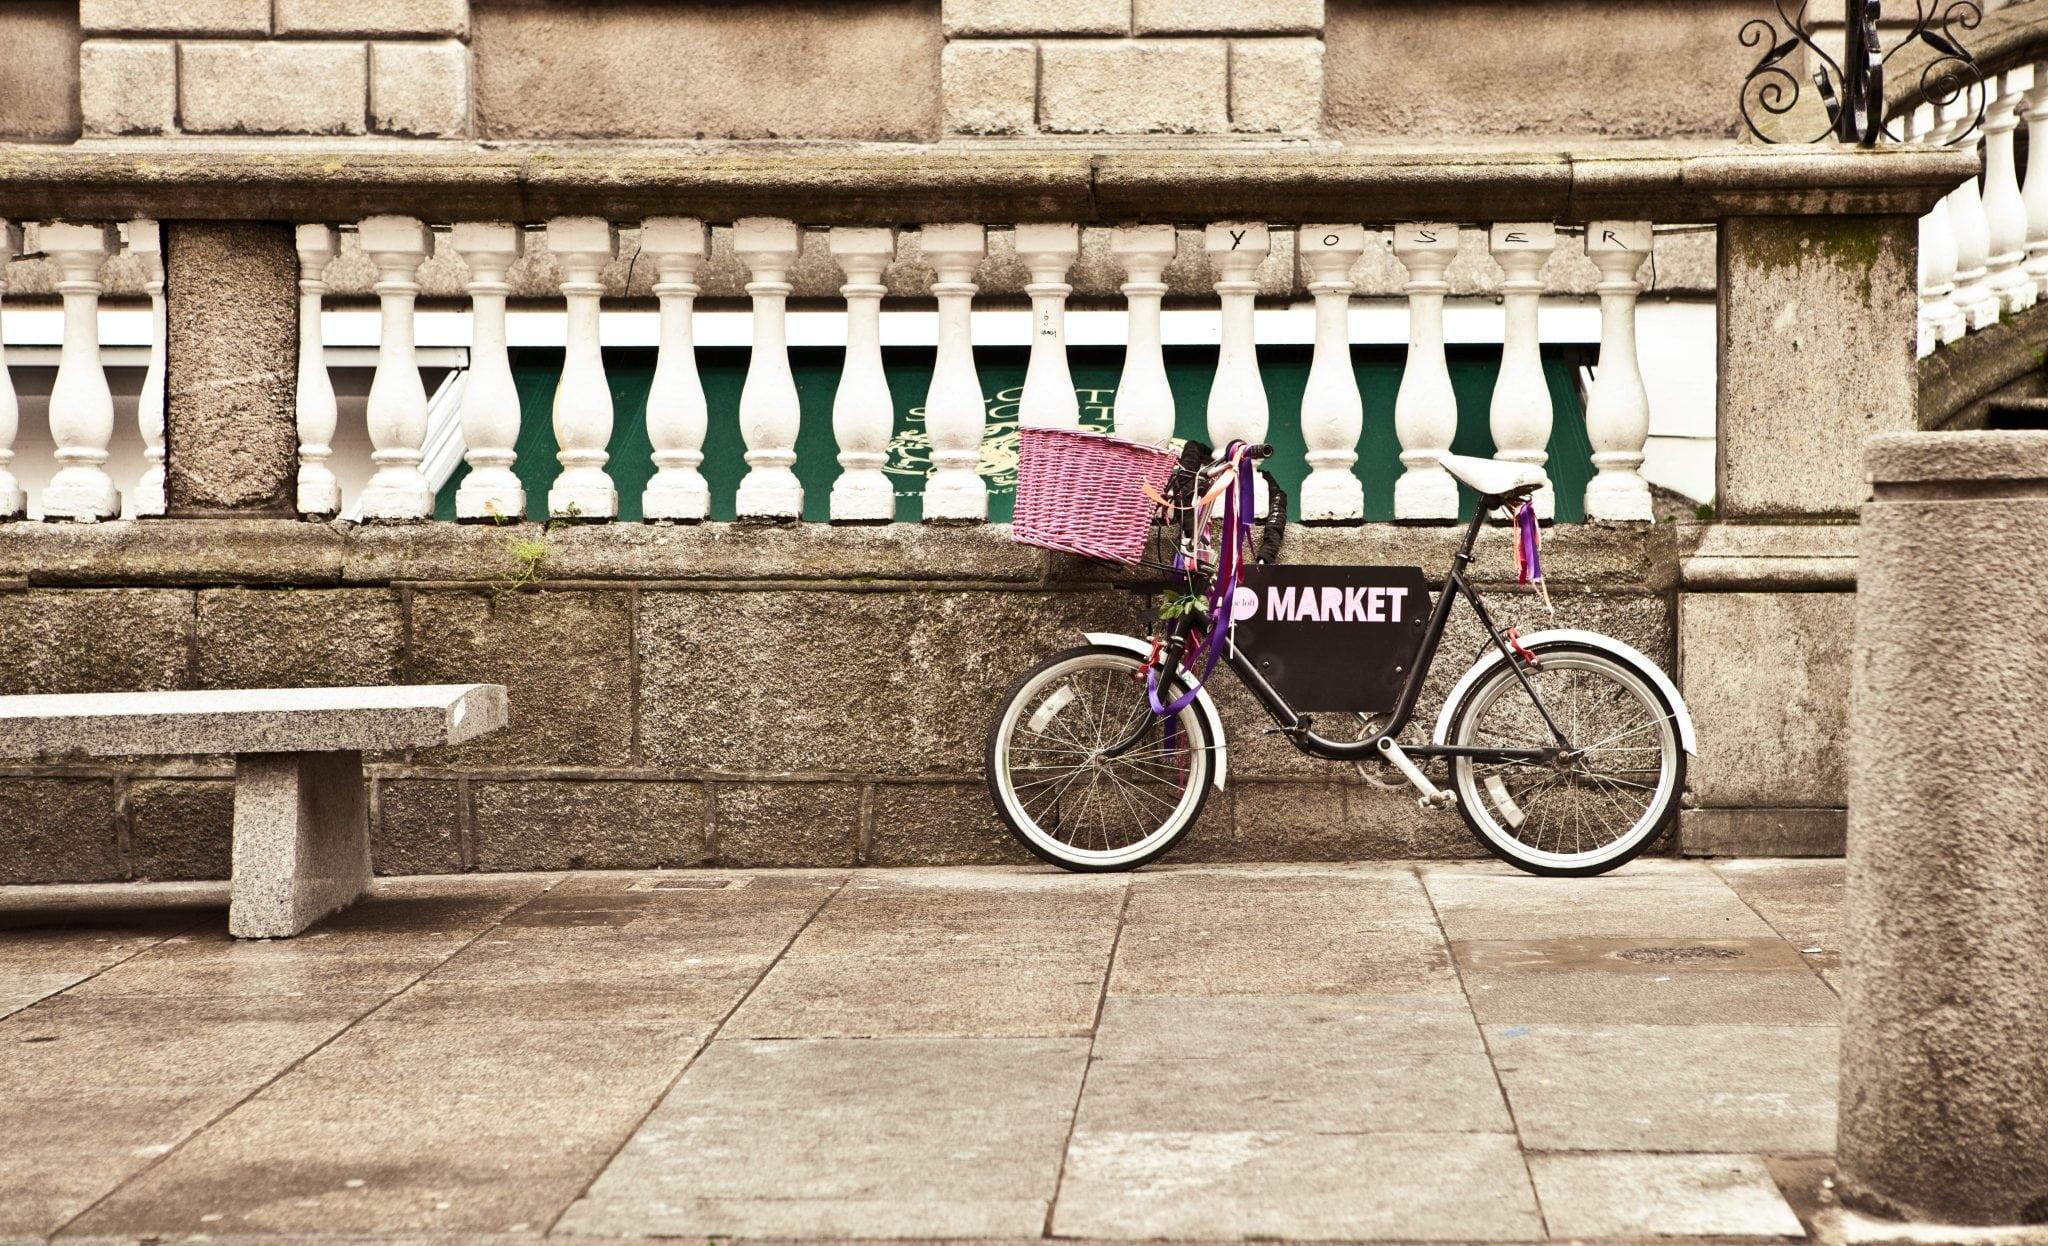 County Dublin, Ireland - Airbnb